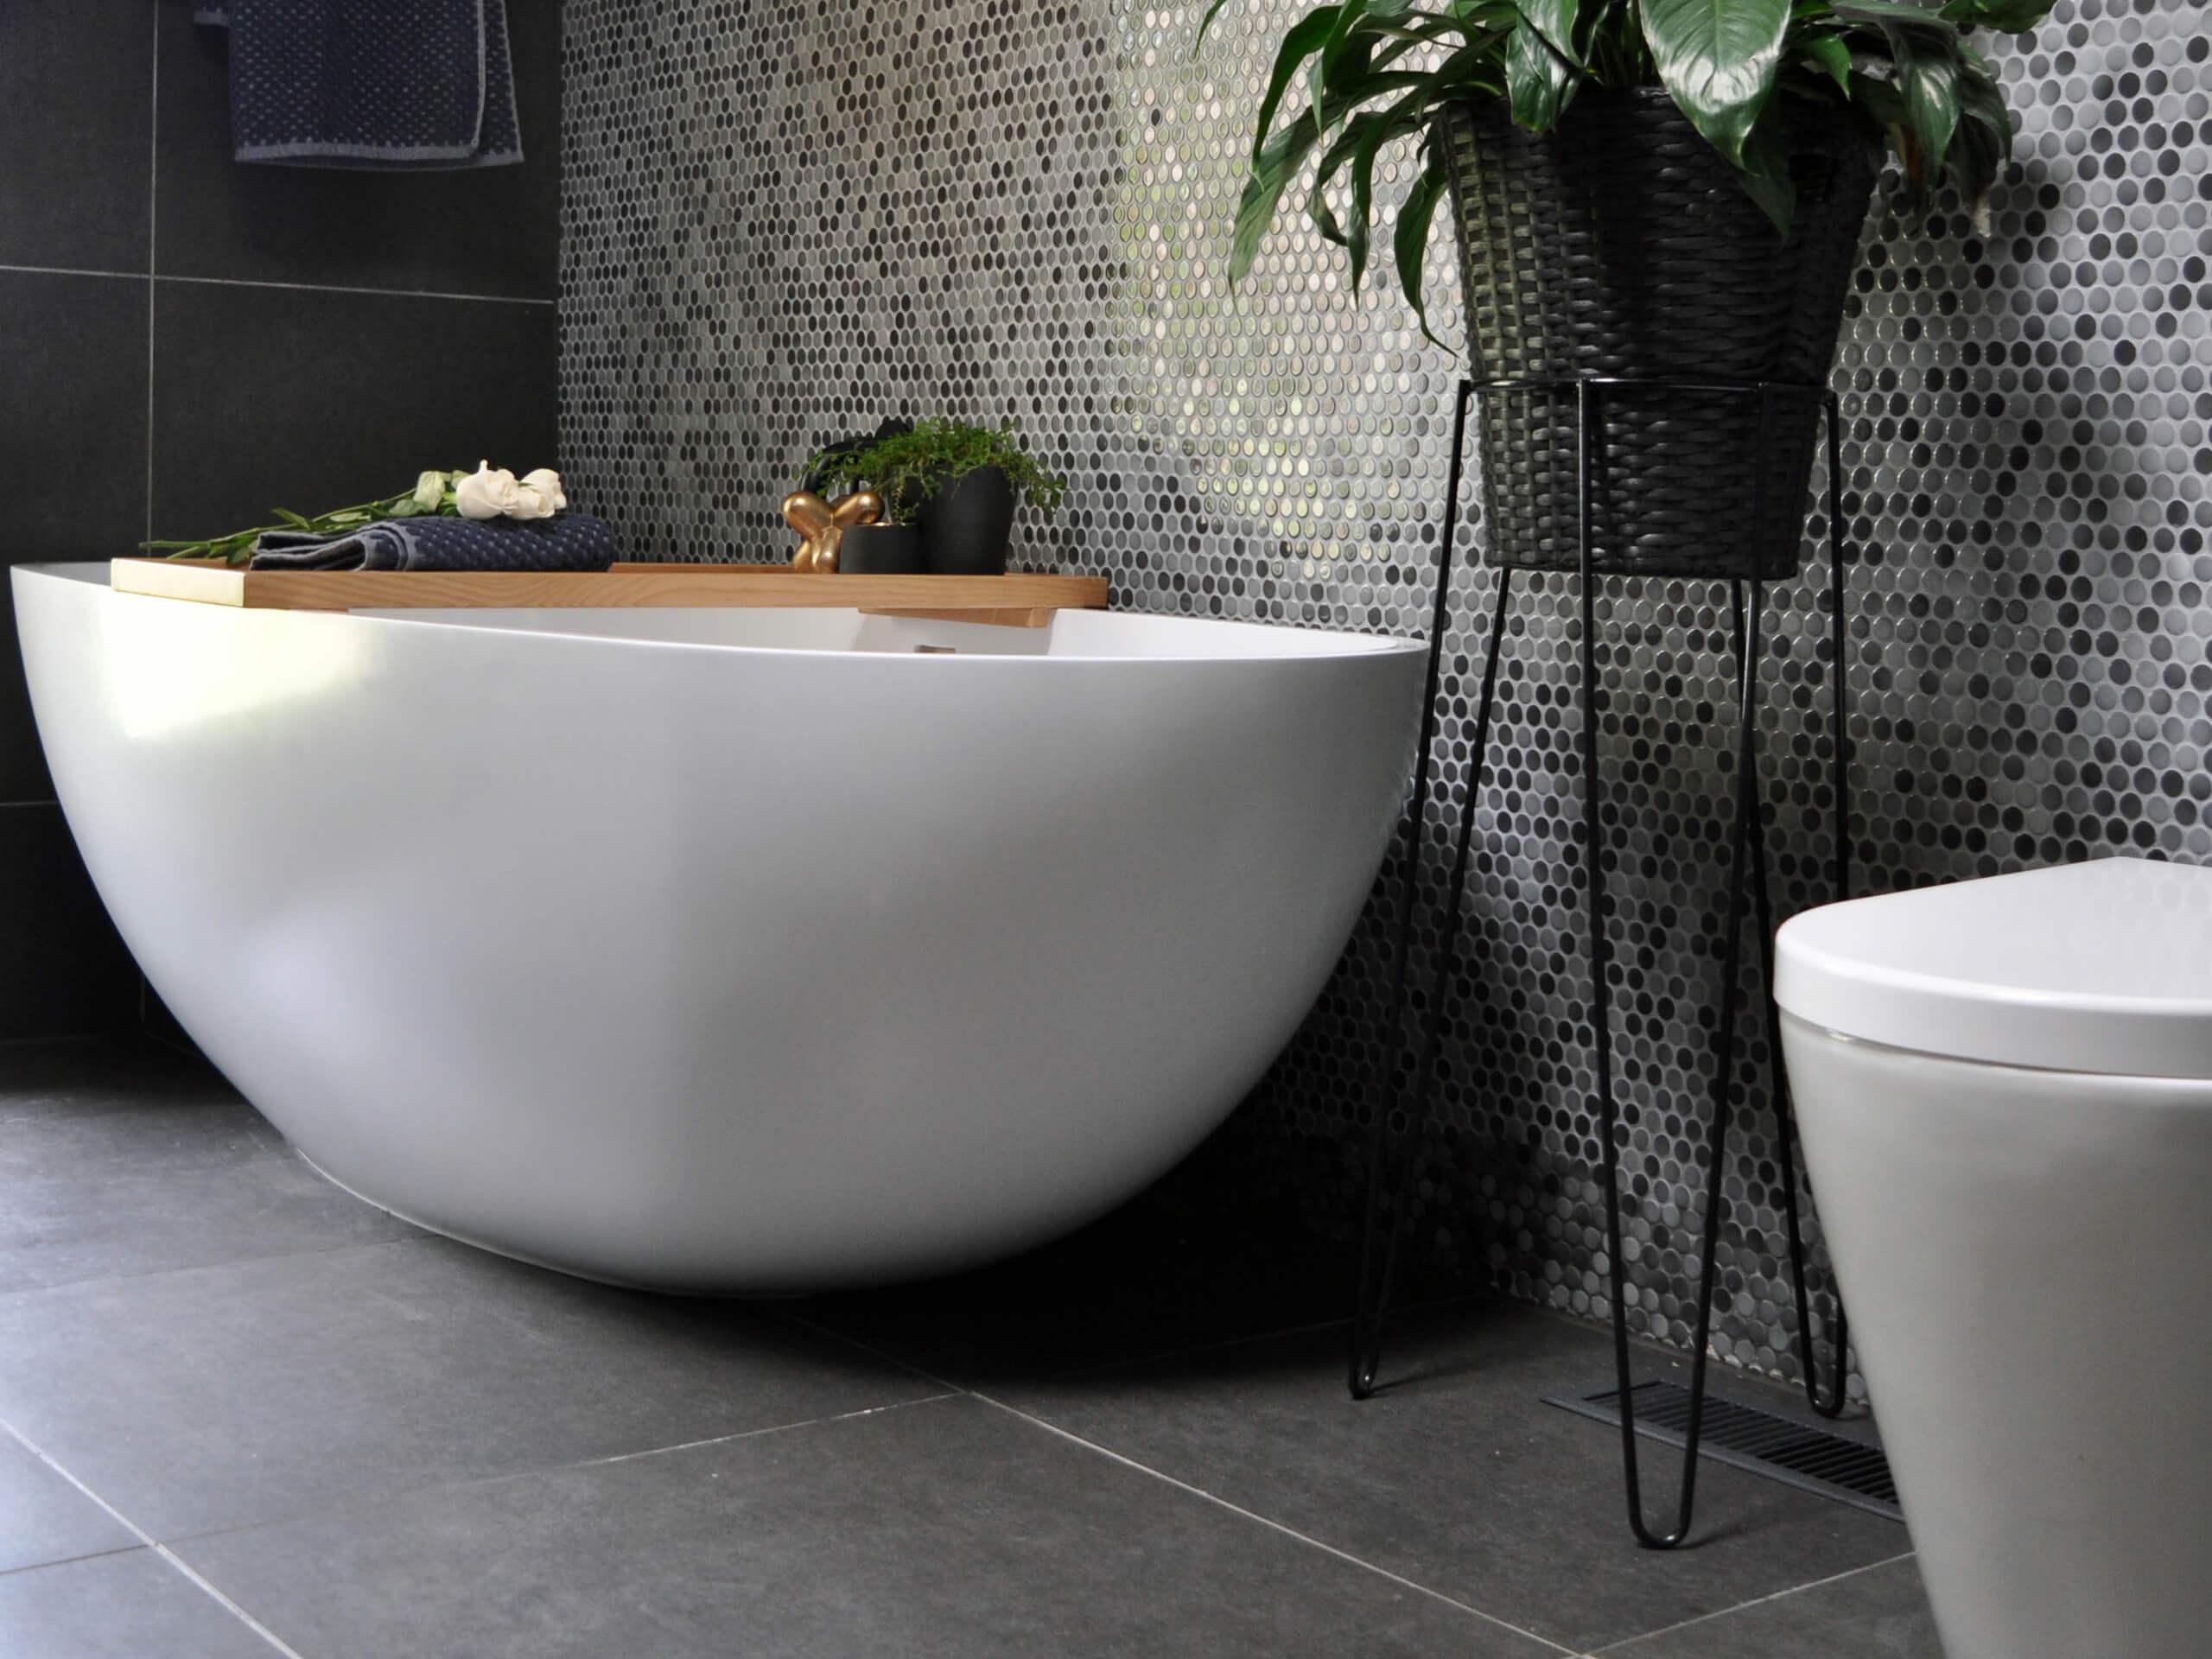 Bathroom tiled 600 x 600 Black Matt & Mosica feature wall